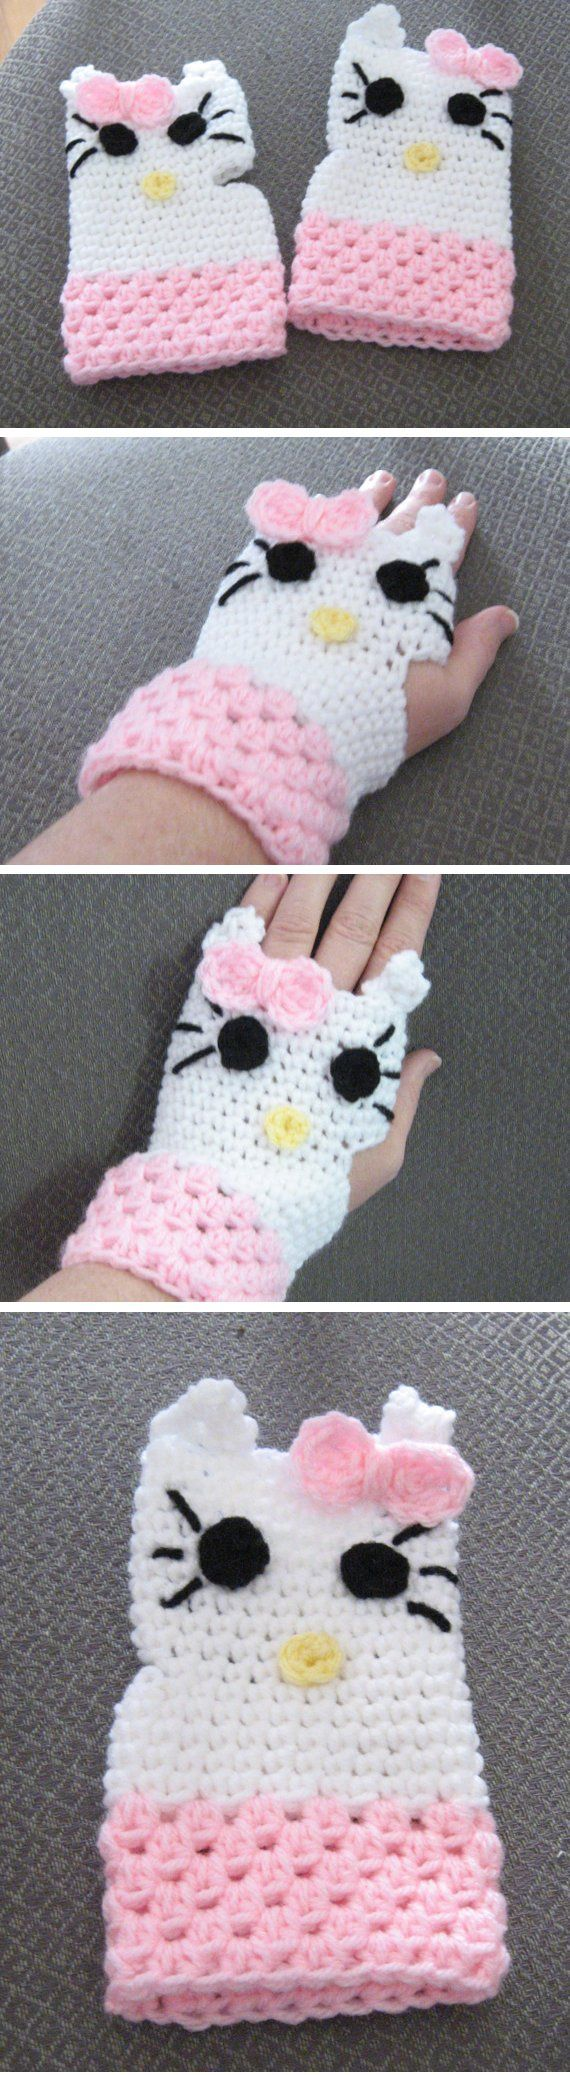 Hello Kitty Wristlets - *Inspiration* | Nerd Crochet :) | Pinterest ...